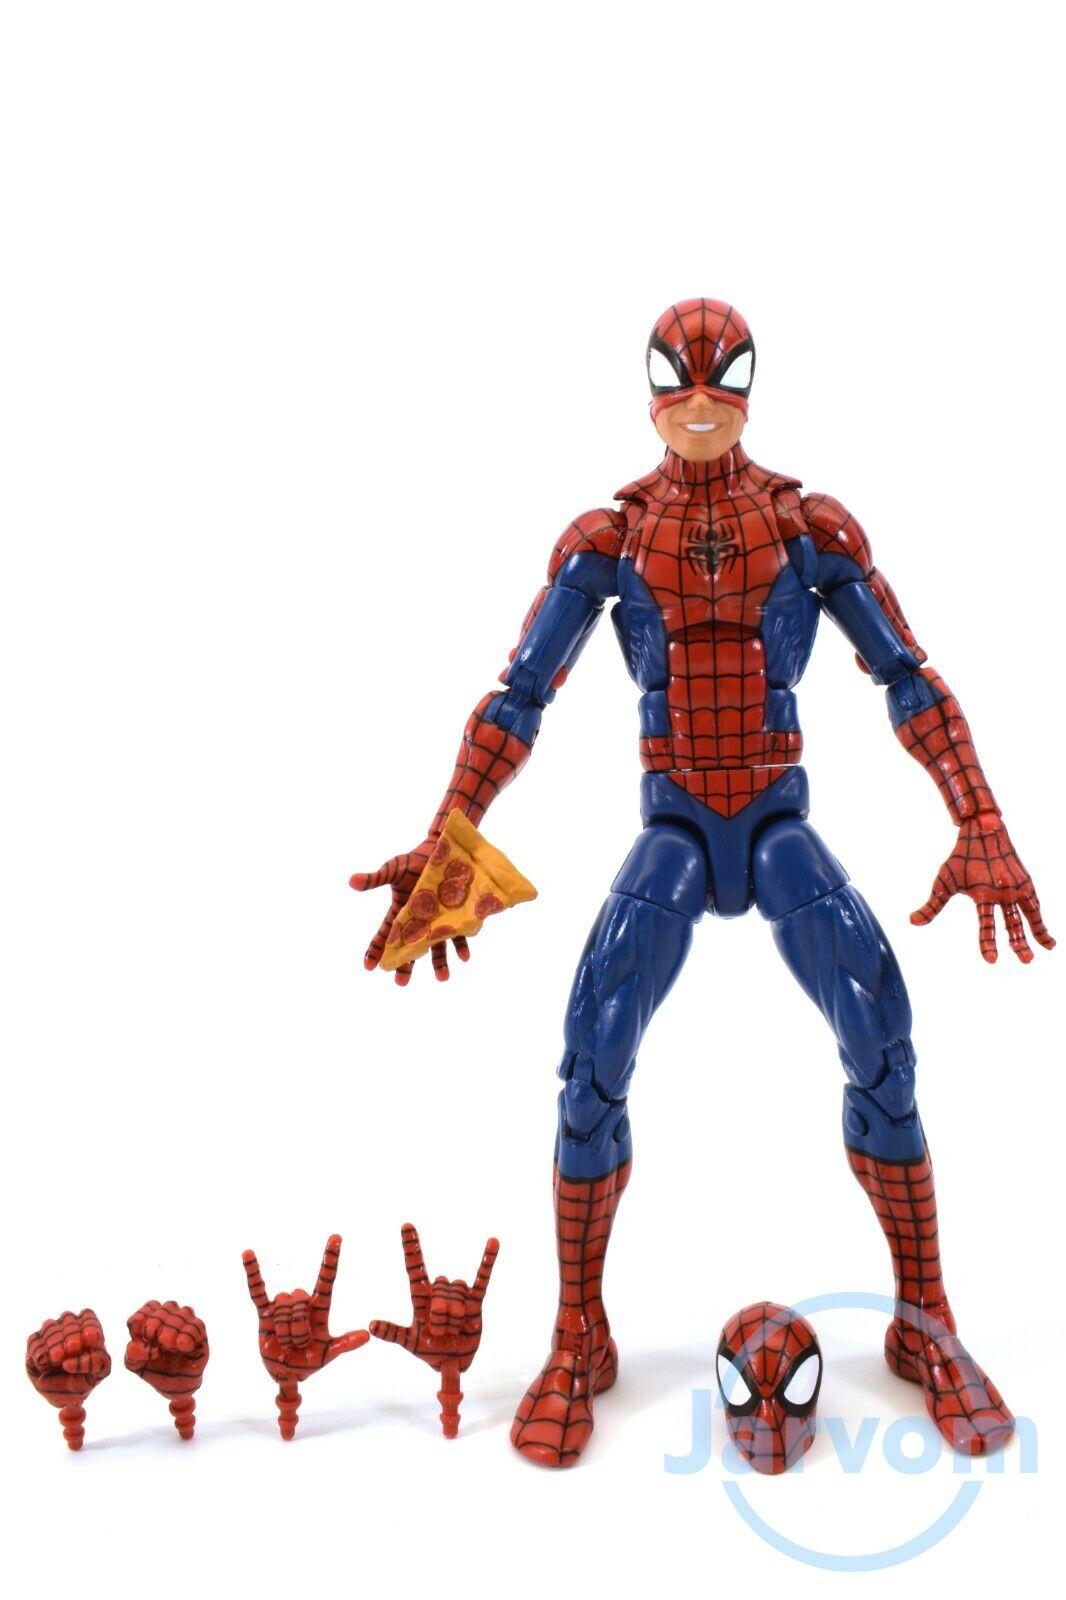 Marvel Leggende 6   Pollici Hobgoblin Baf Onda Pizza Spider-uomo Sciolto Completo